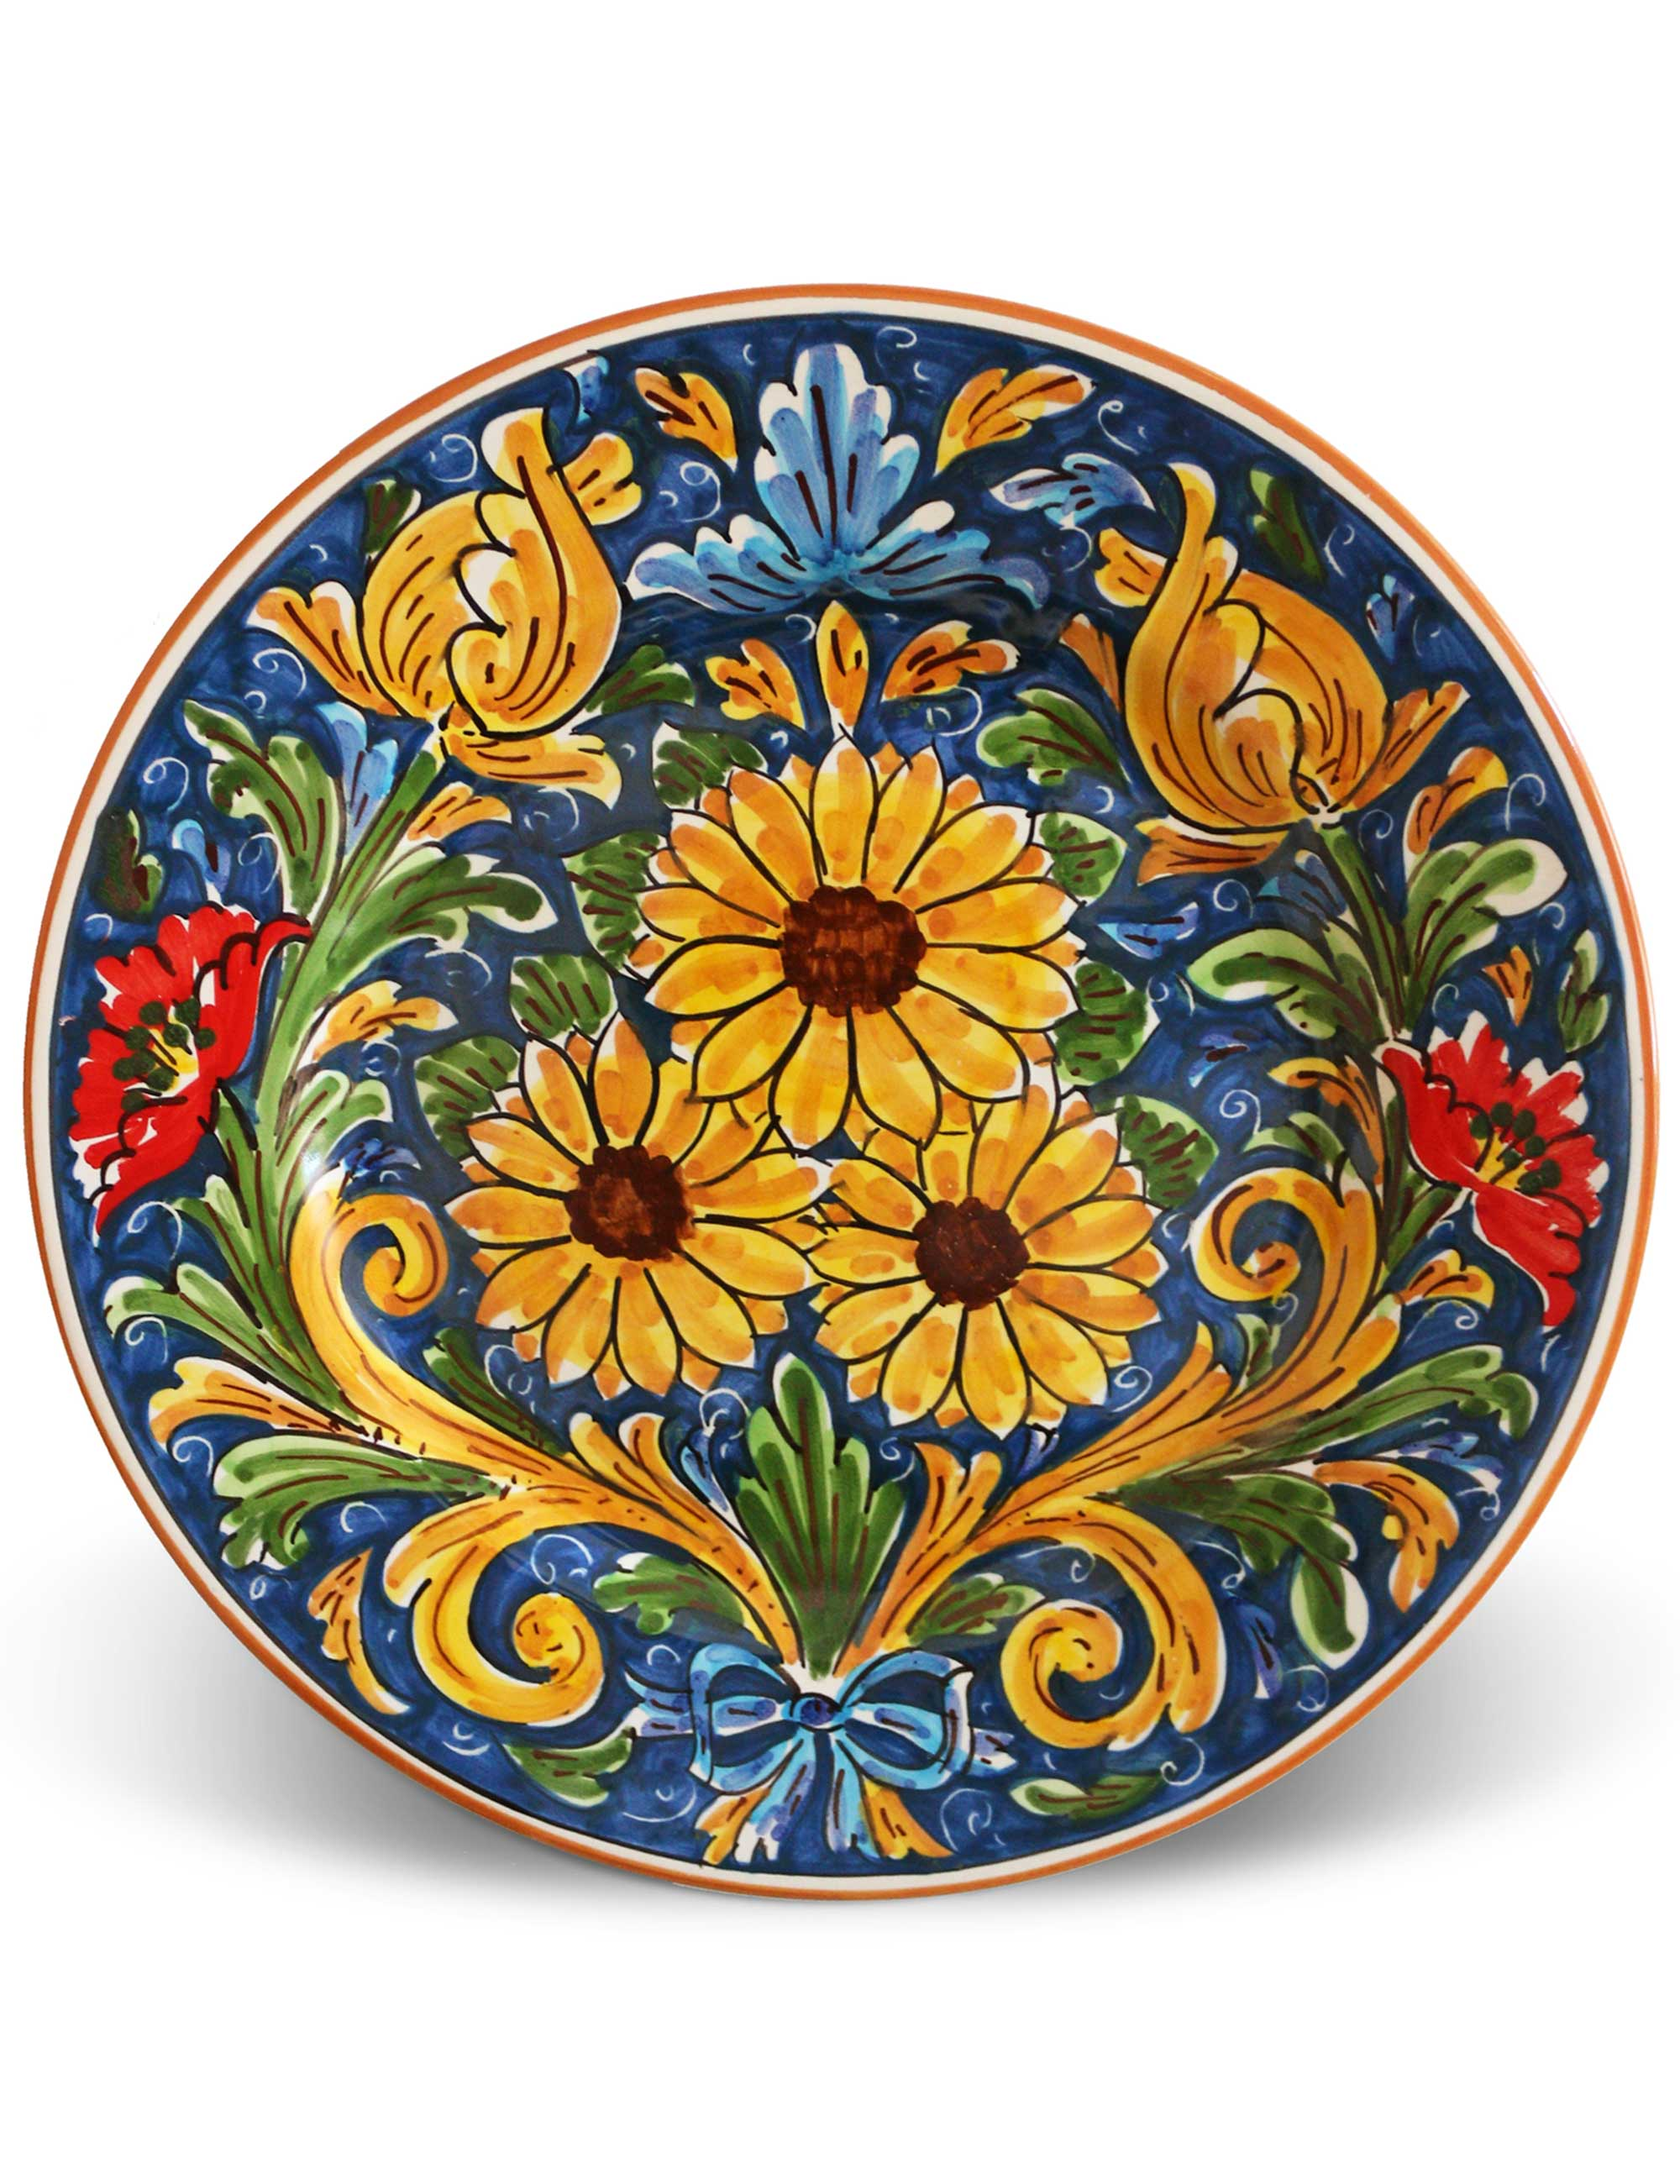 Flat plate Sicilian ceramic SCIACCA  sc 1 st  Ceramiche Caltagirone Maremoro & FLAT PLATE SICILIAN CERAMIC - SCIACCA   Maremoro